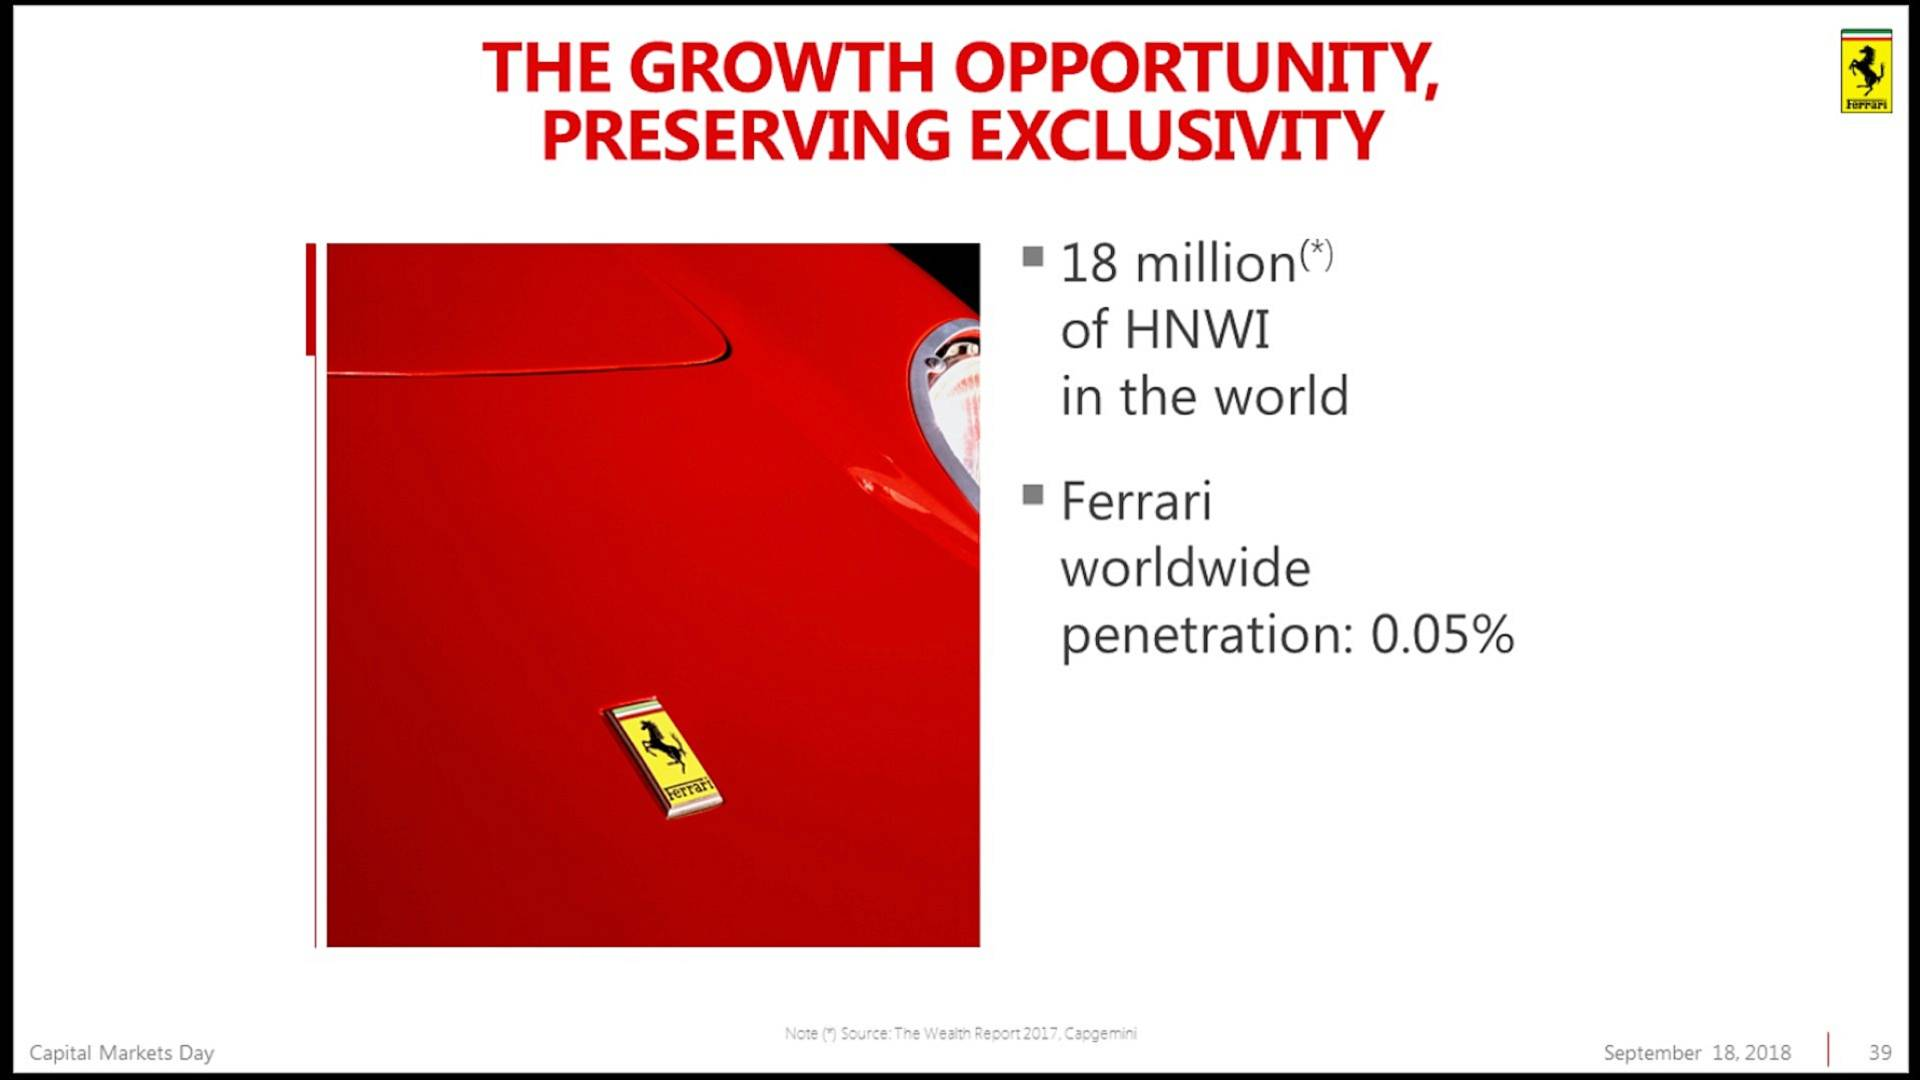 Piano Industriale Ferrari 2018-2022 (35)